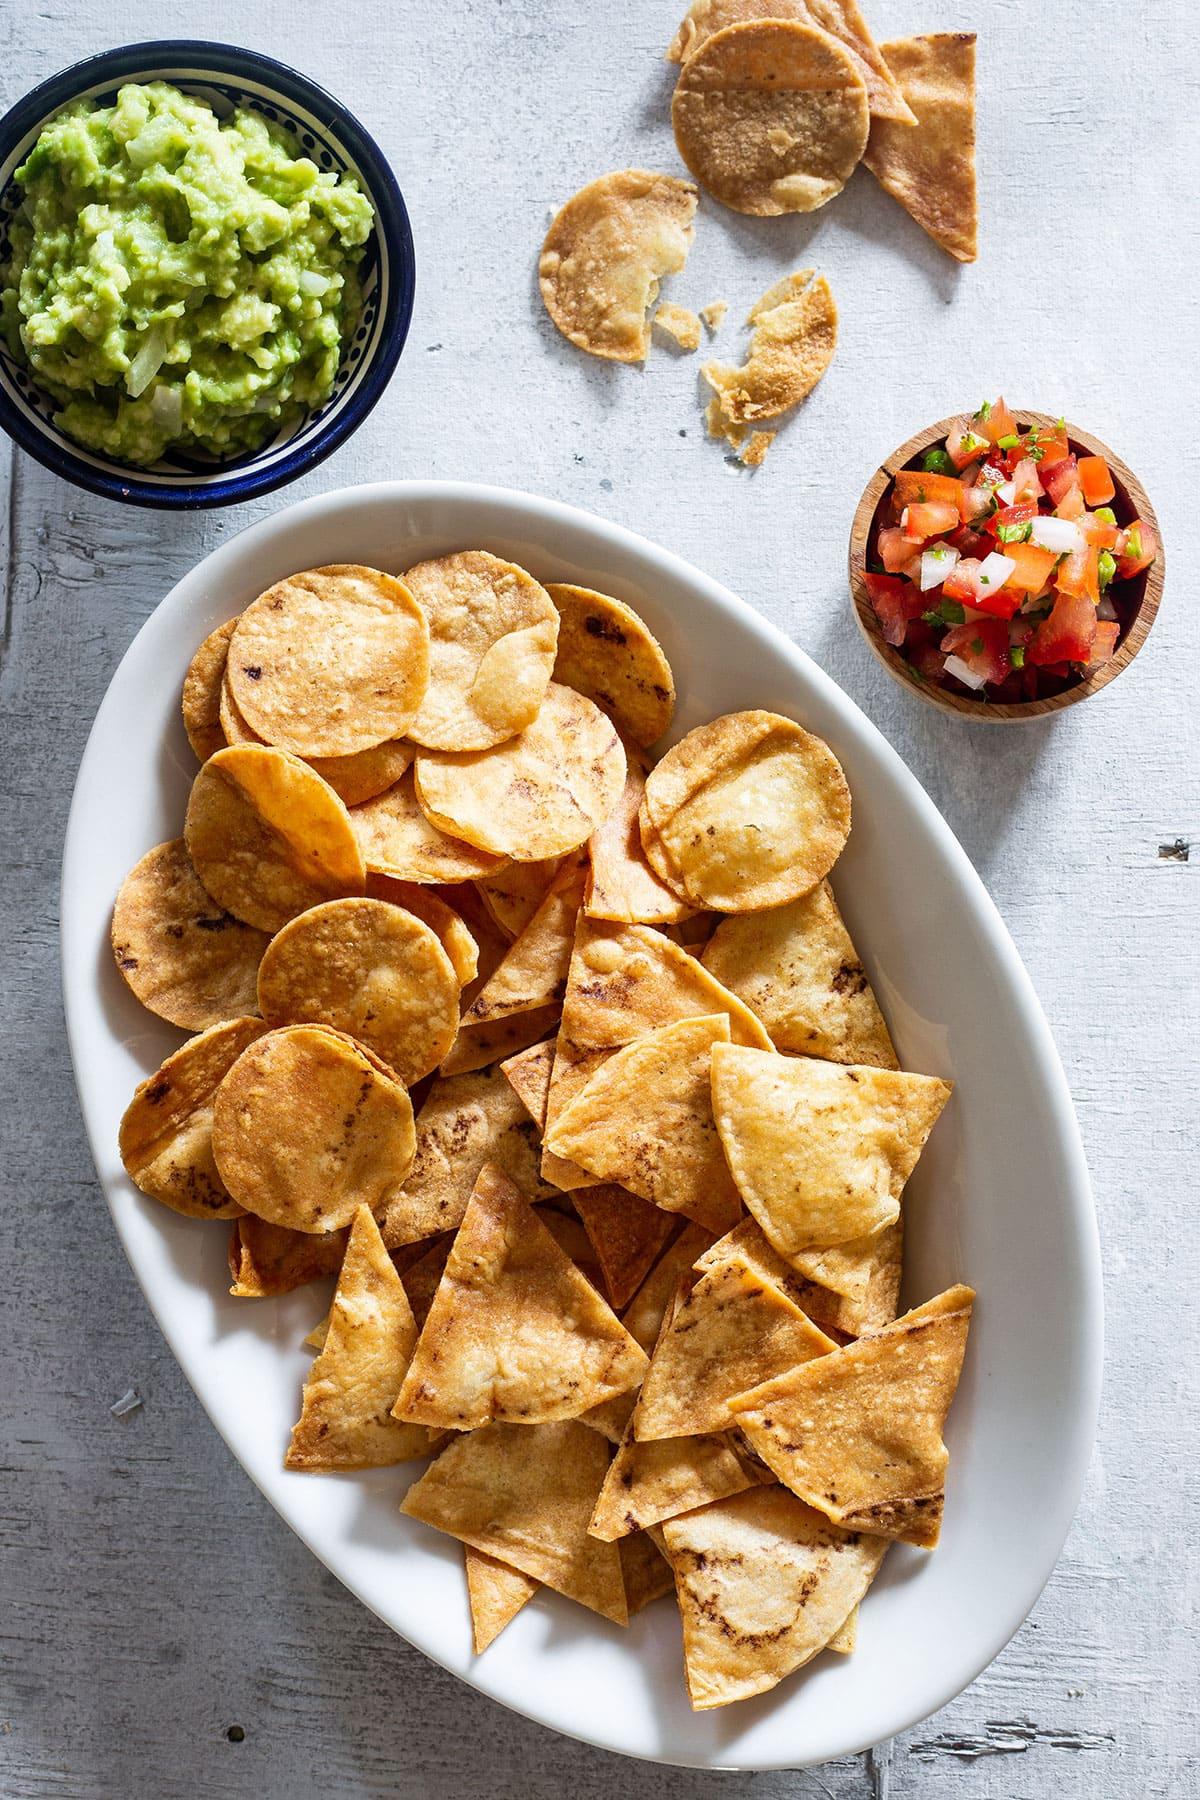 Totopos served with guacamole and pico de gallo salsa.